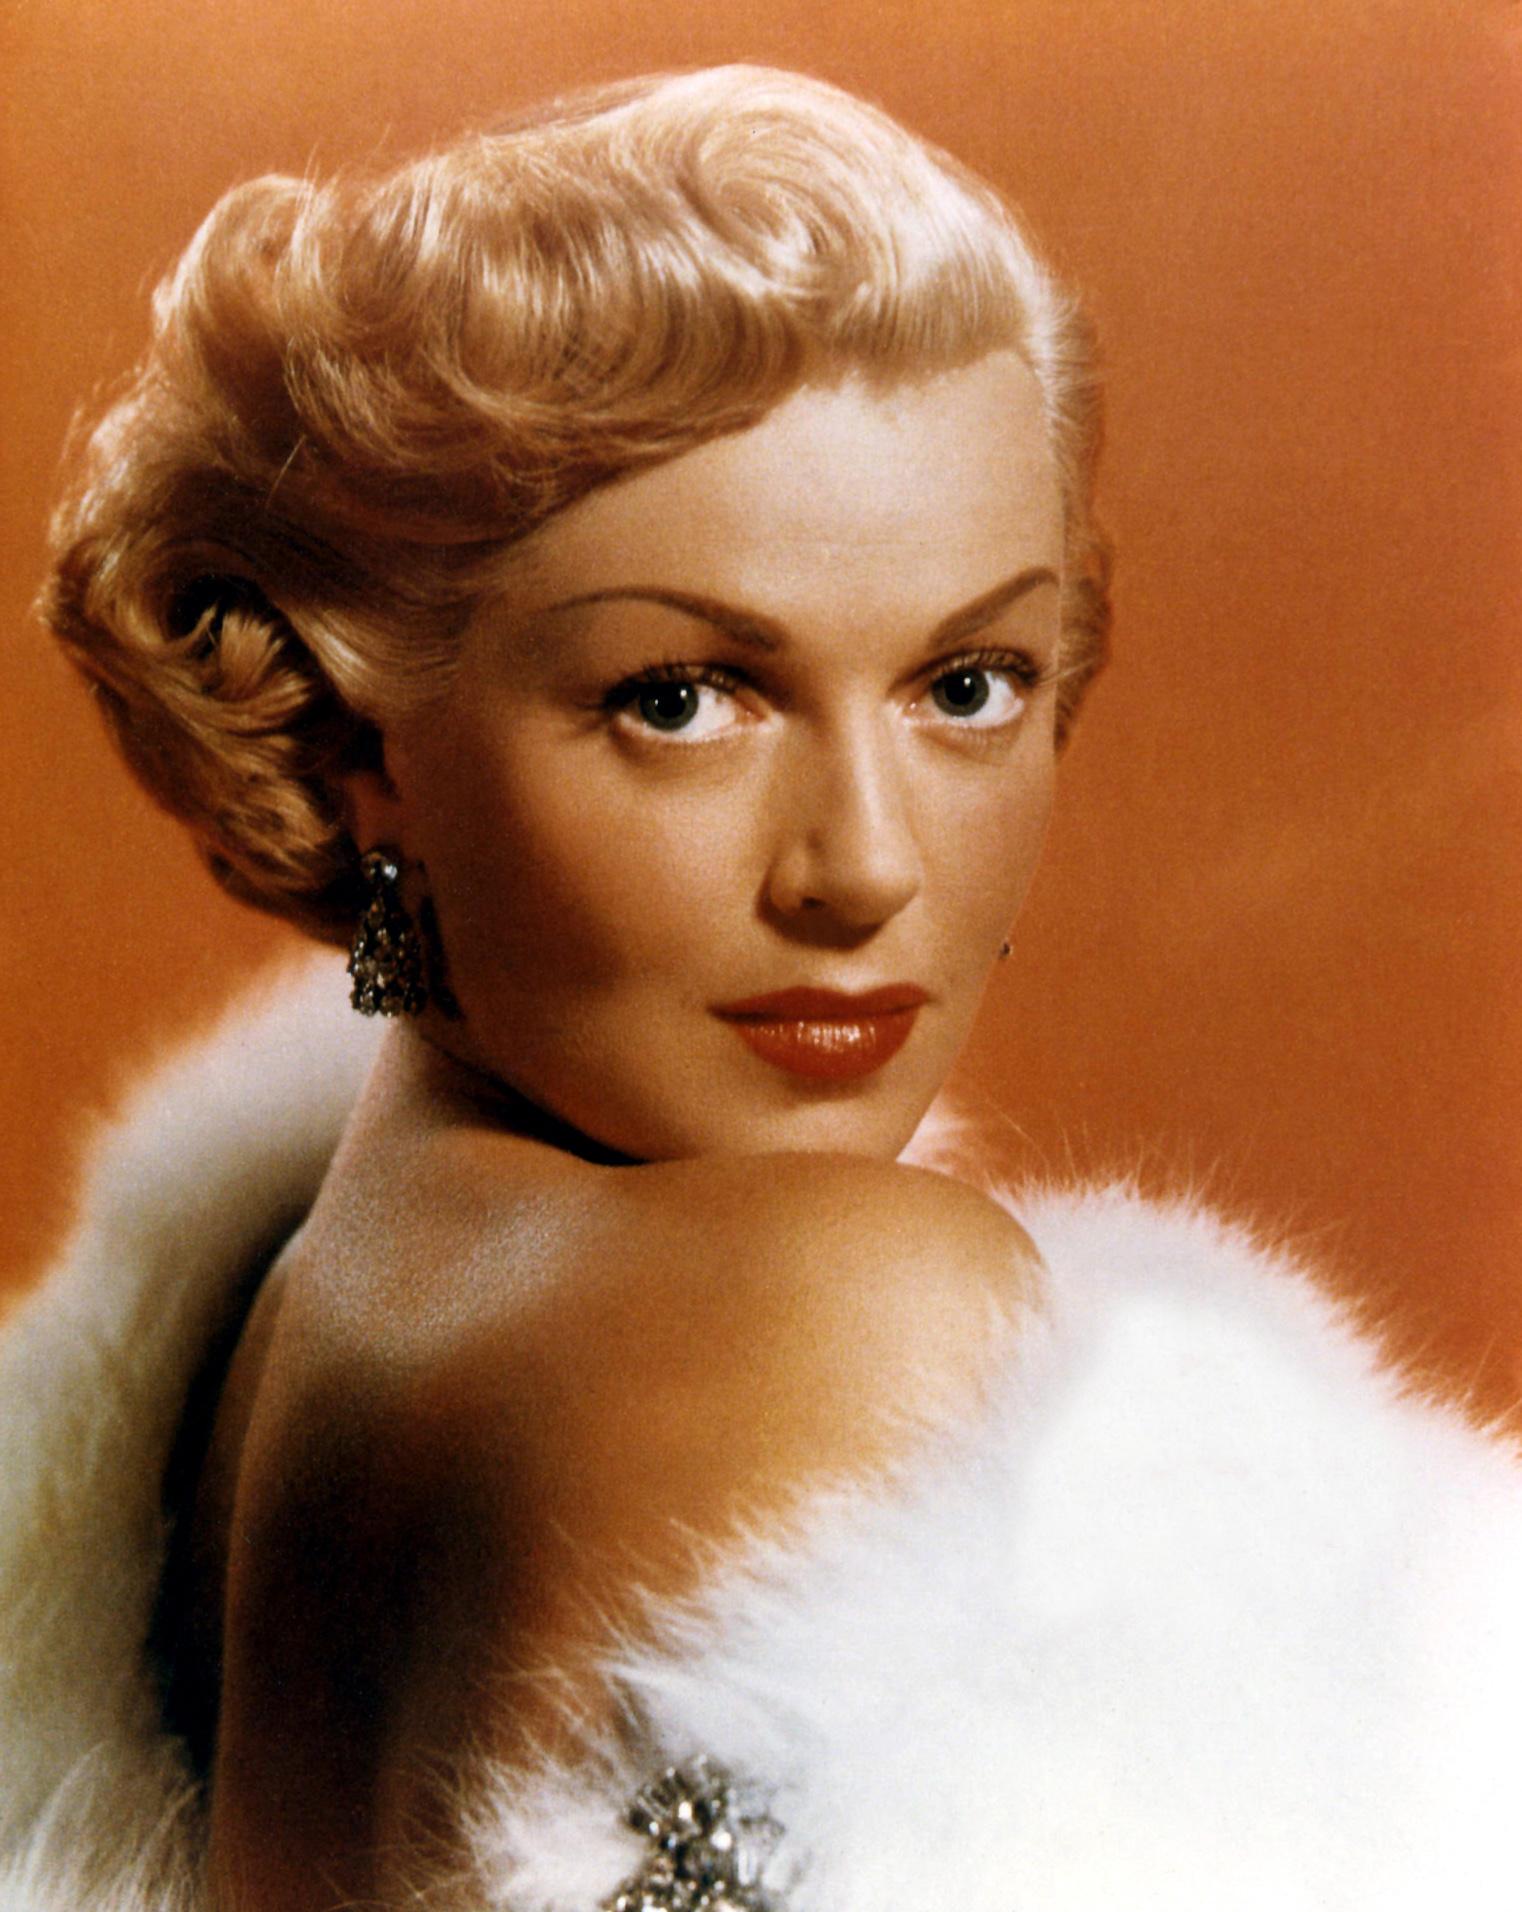 Lana Turner Photo 22 Of 53 Pics Wallpaper Photo 367473